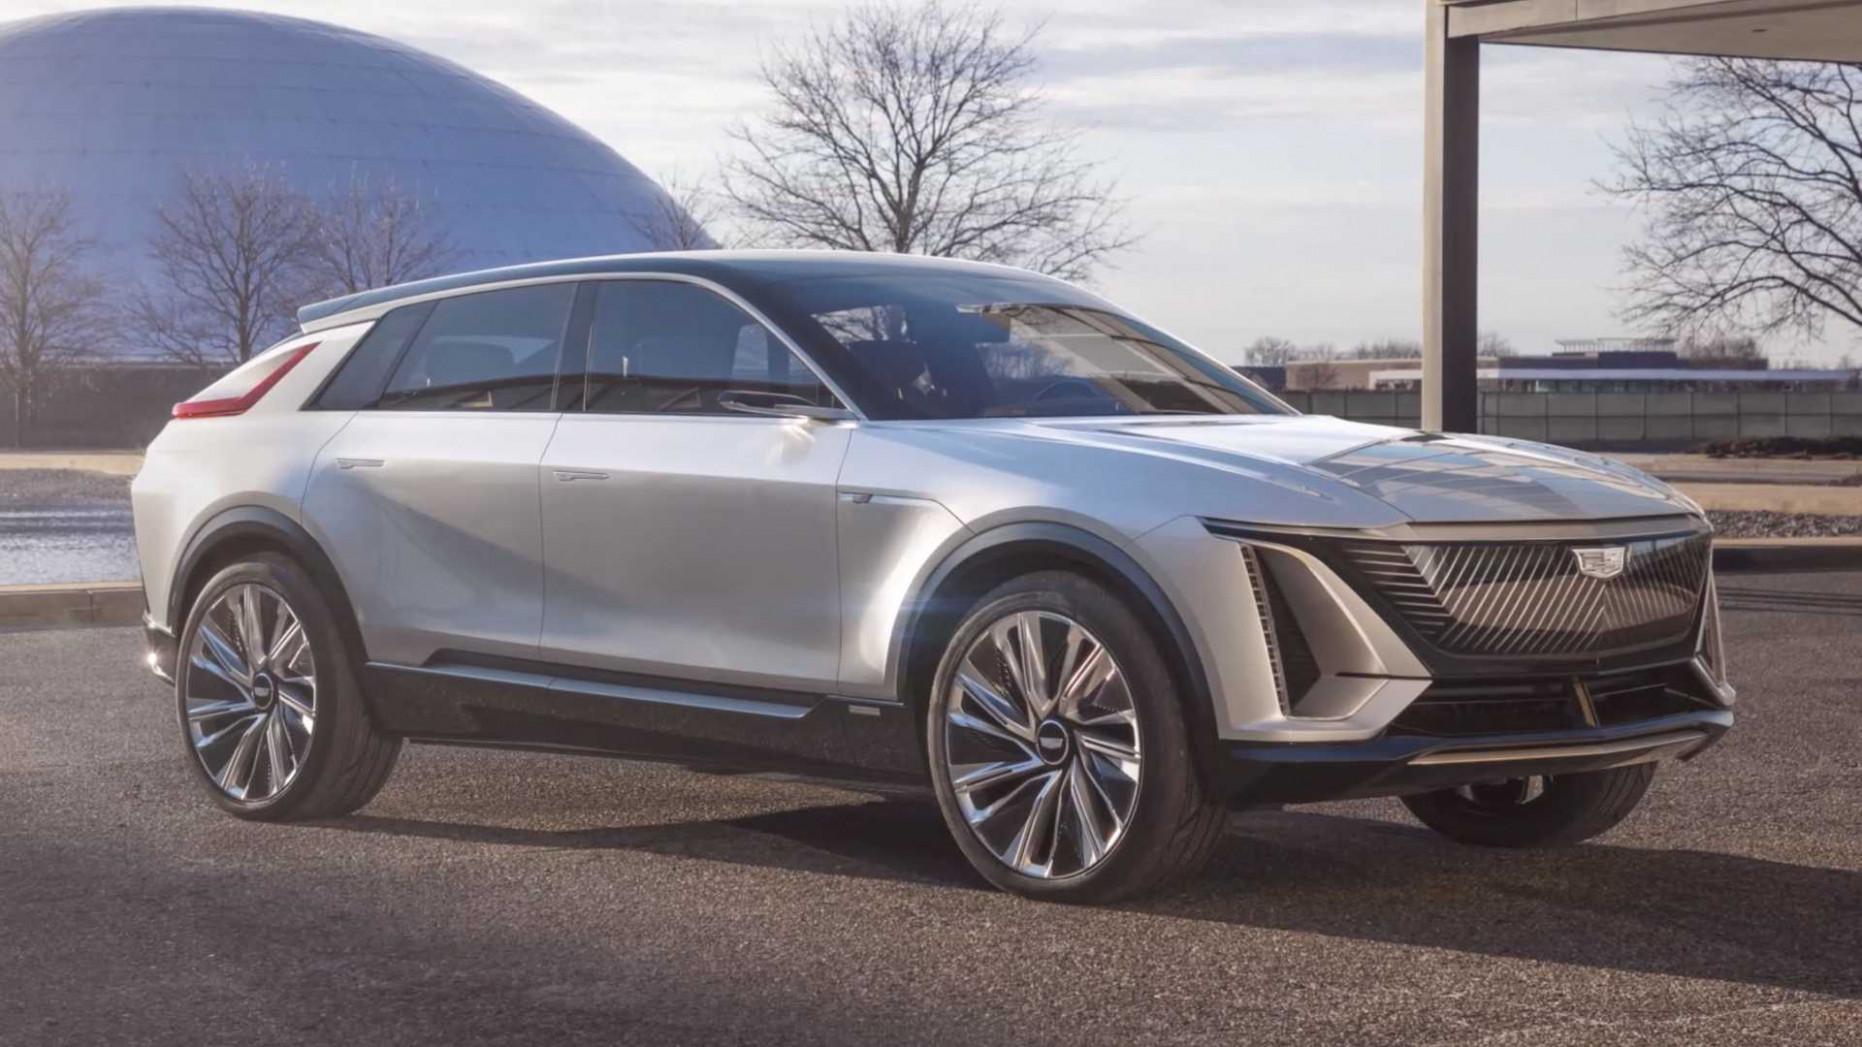 Style Cadillac Suv 2022